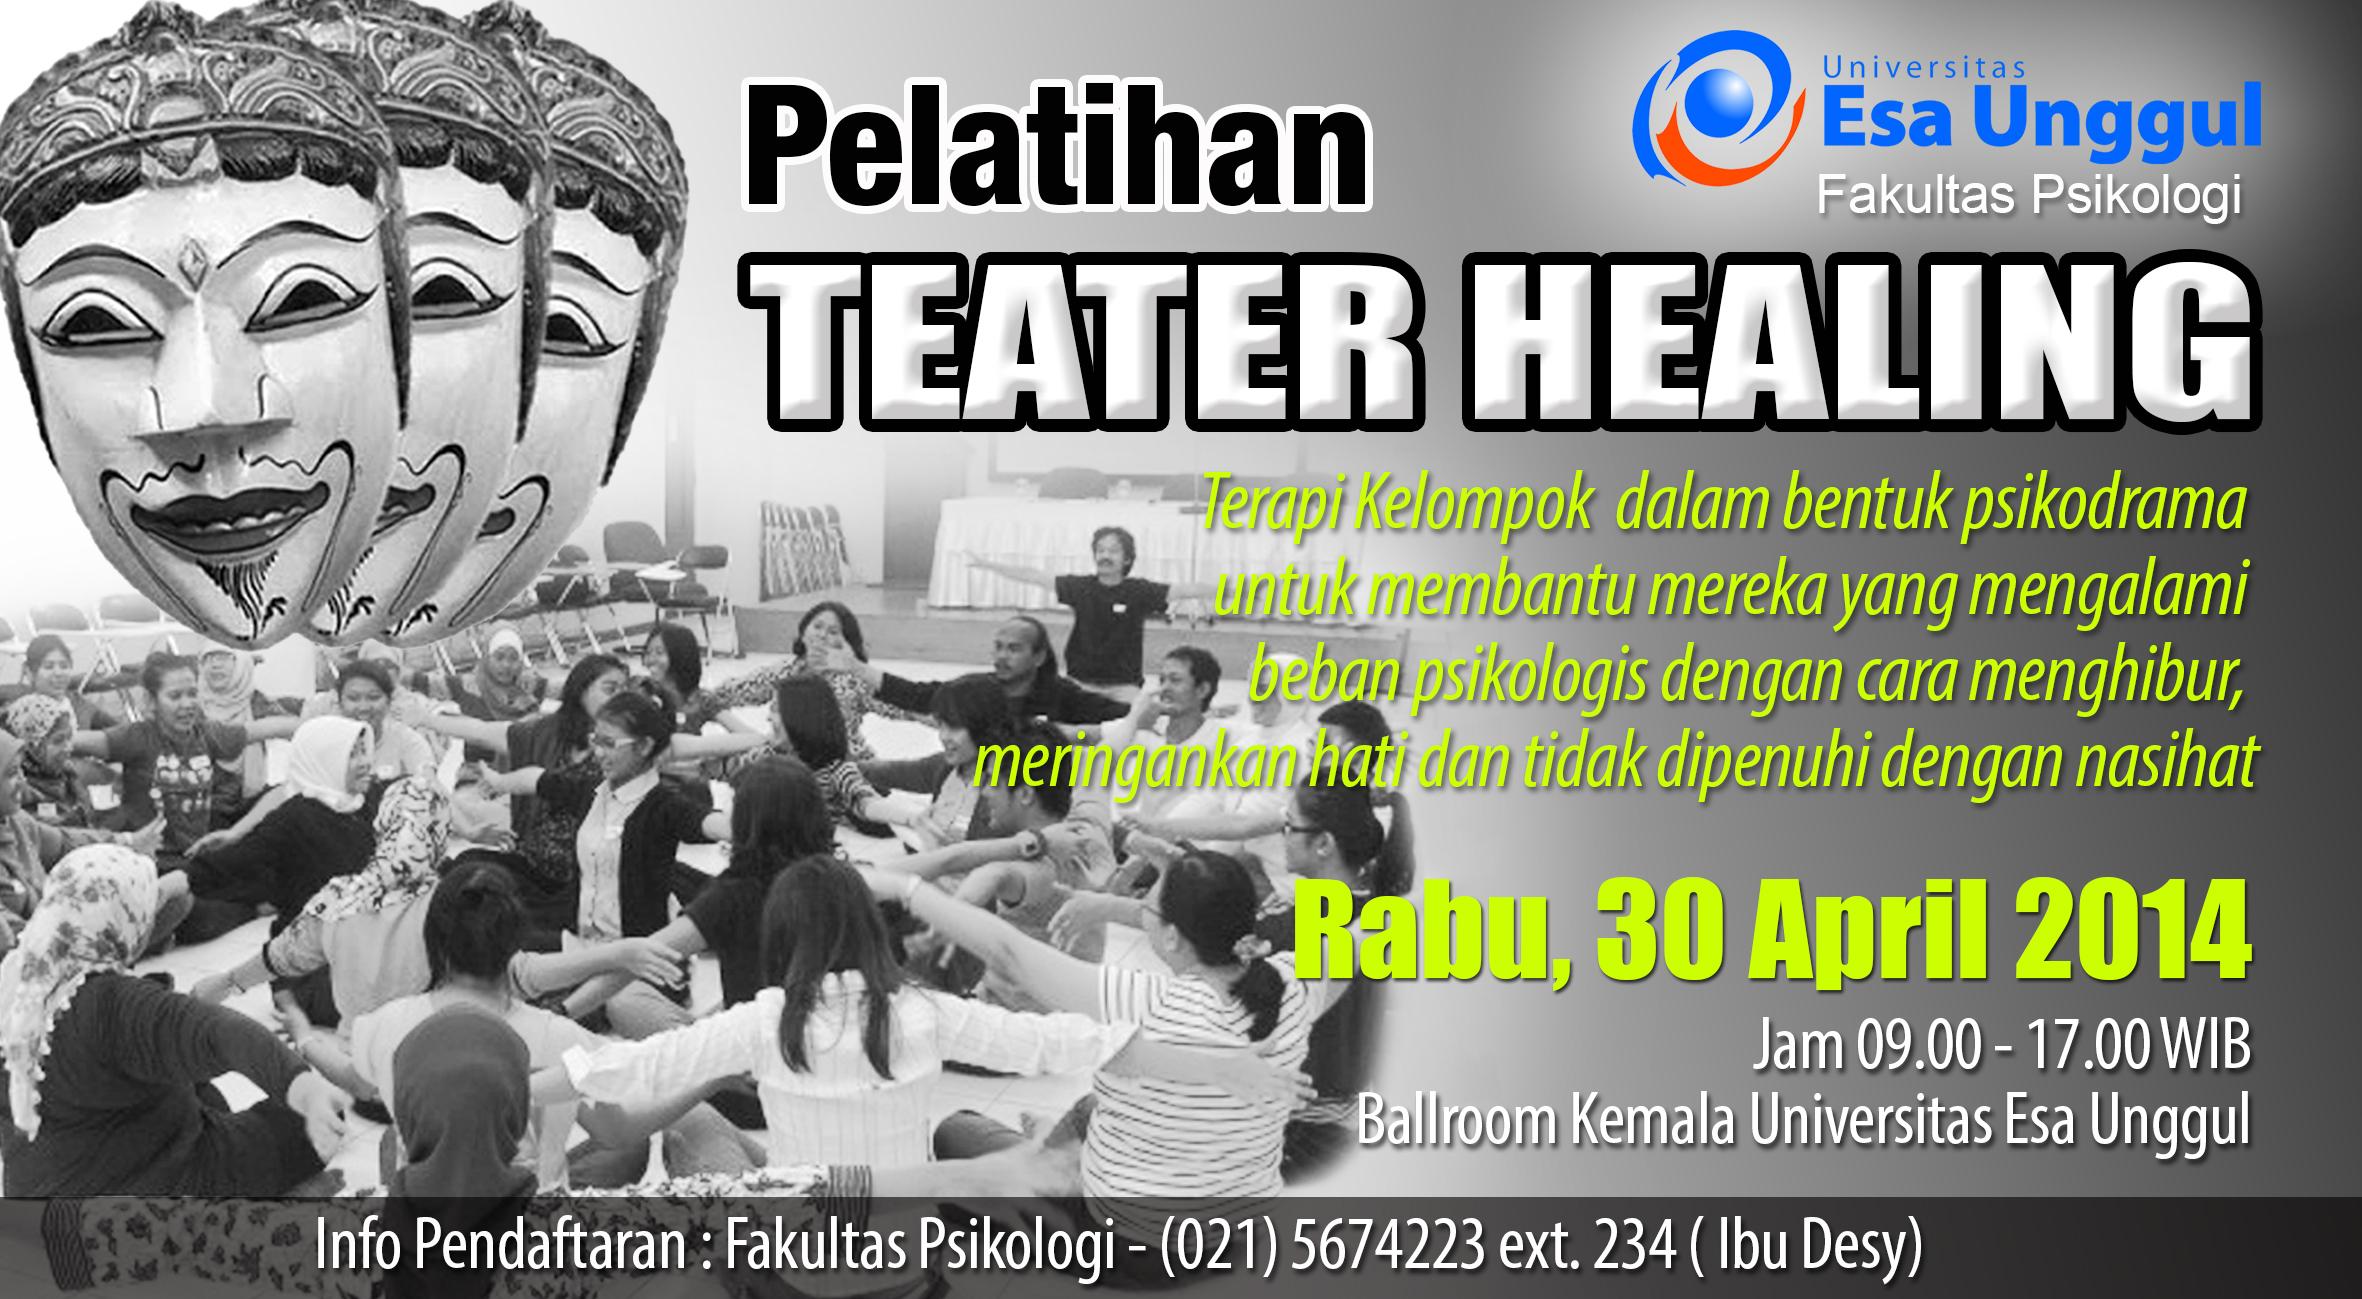 Fakultas Psikologi Universitas Esa Unggul menyelenggarakan Pelatihan THEATER HEALING